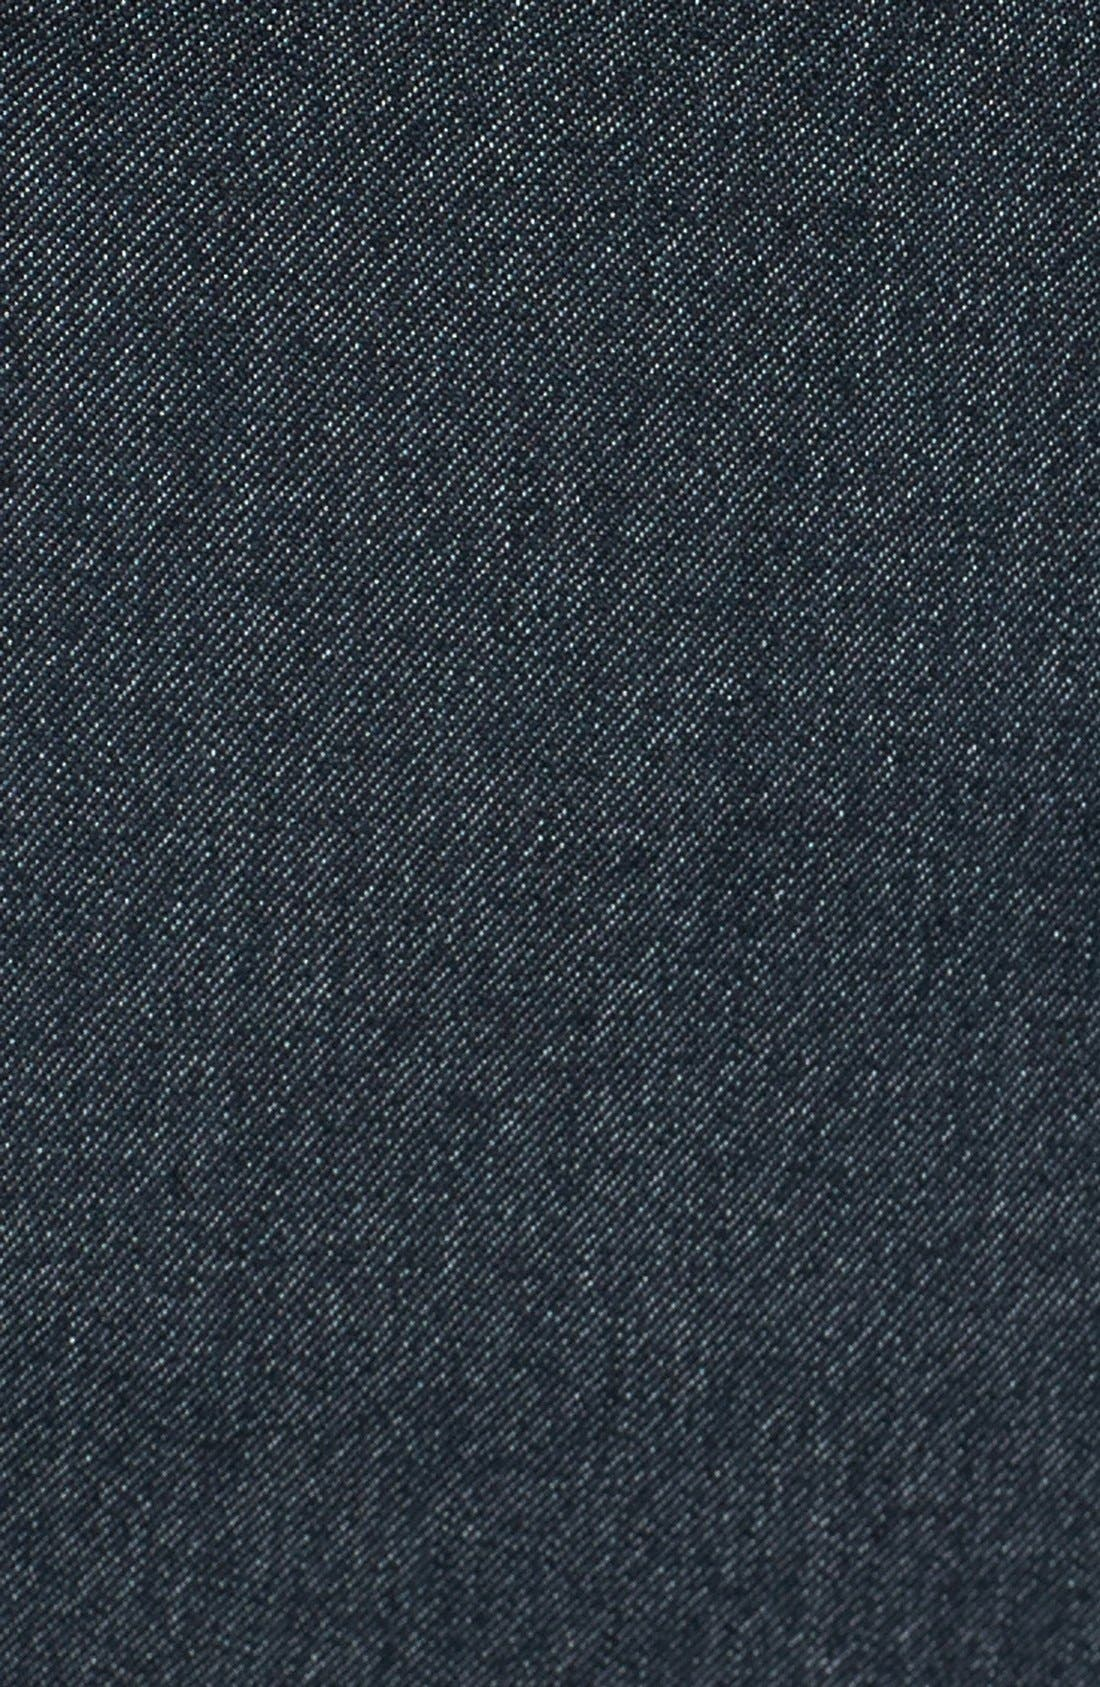 Alternate Image 3  - Betsey Johnson Laser Cut Denim Fit & Flare Dress